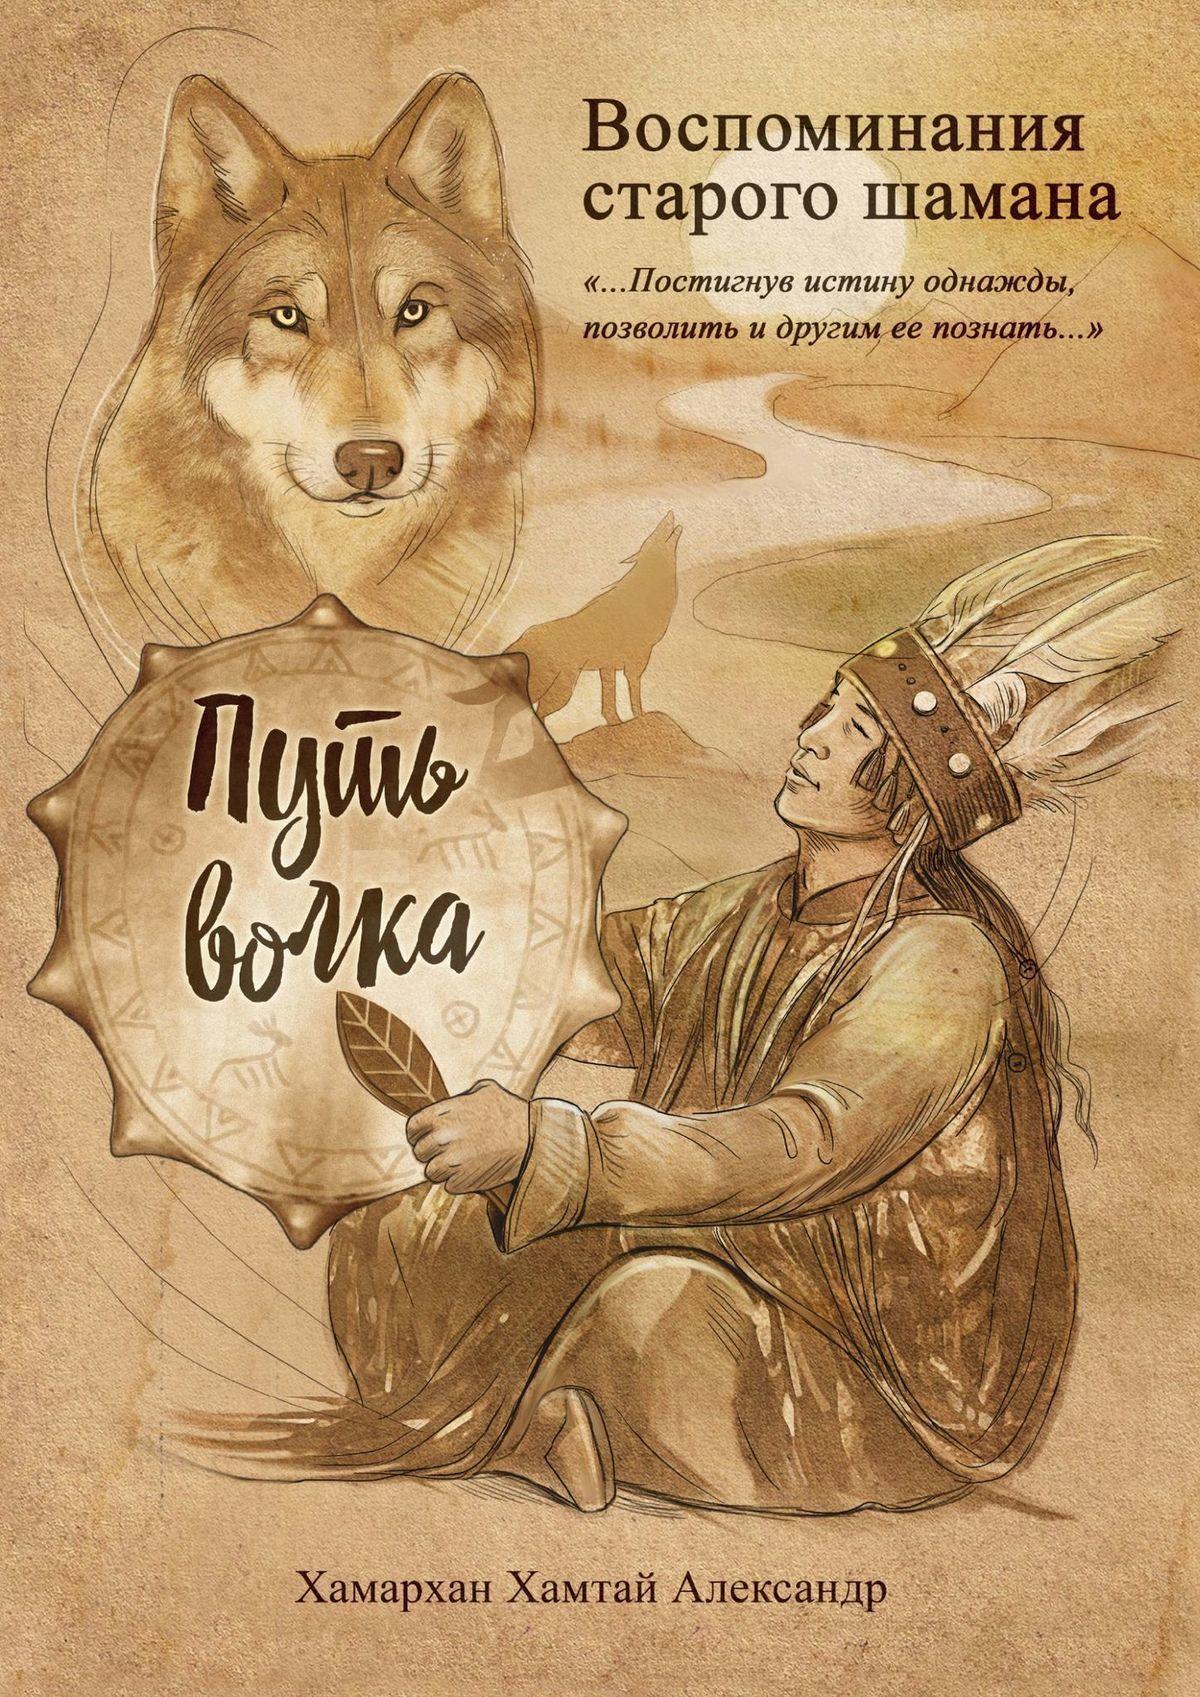 Хамархан Хамтай Александр - Воспоминания старого шамана. Путь волка